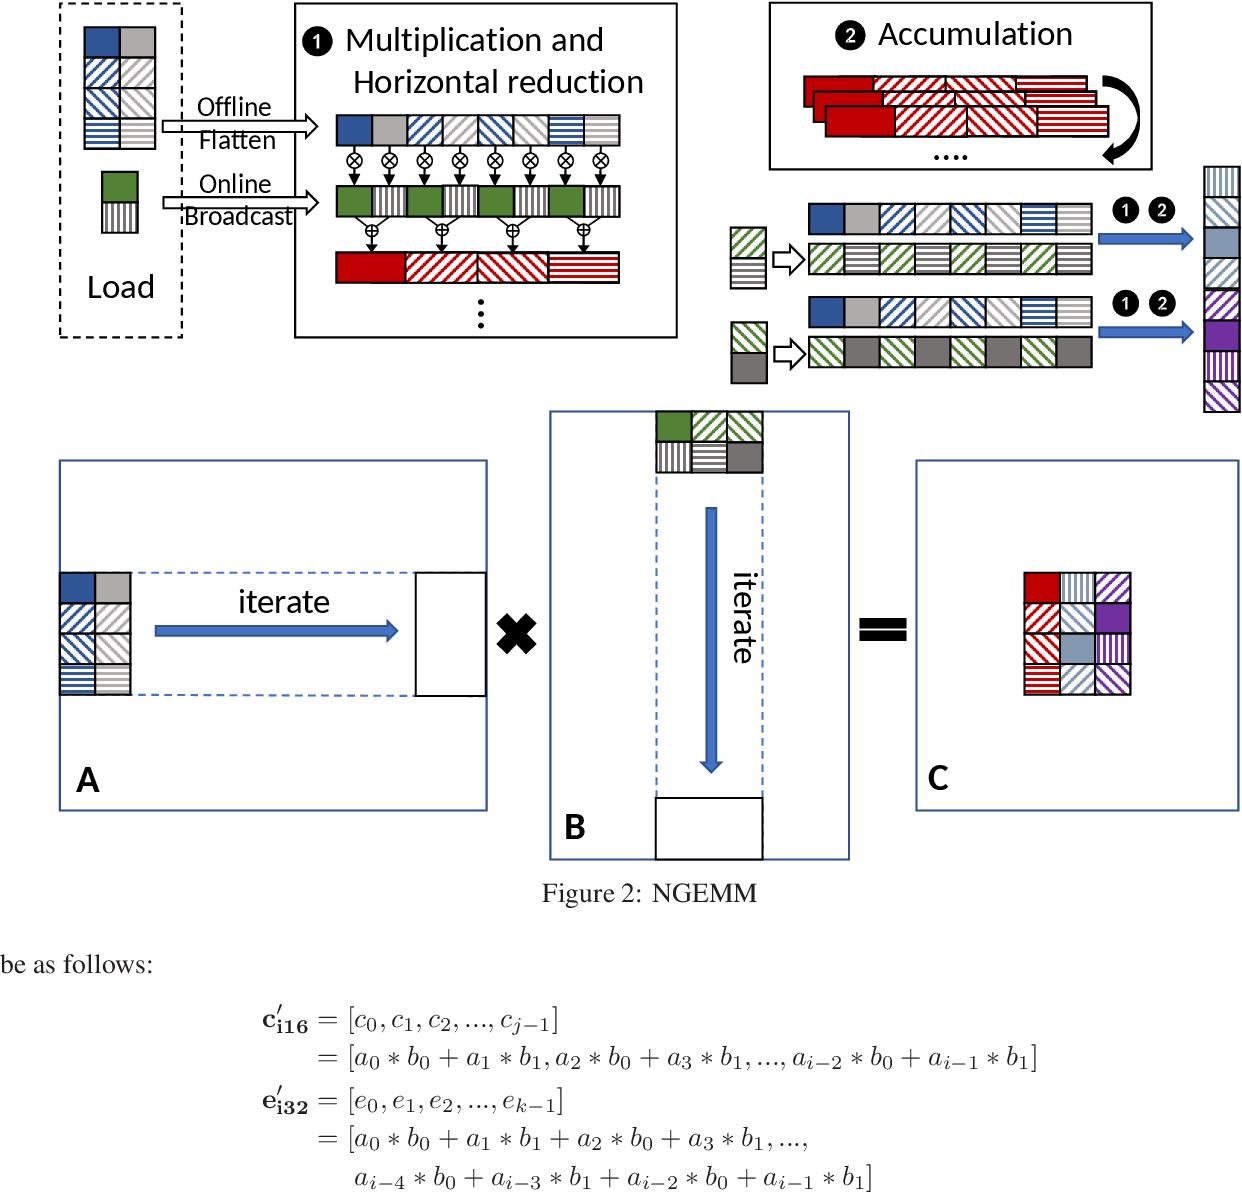 Figure 2 for NGEMM: Optimizing GEMM for Deep Learning via Compiler-based Techniques